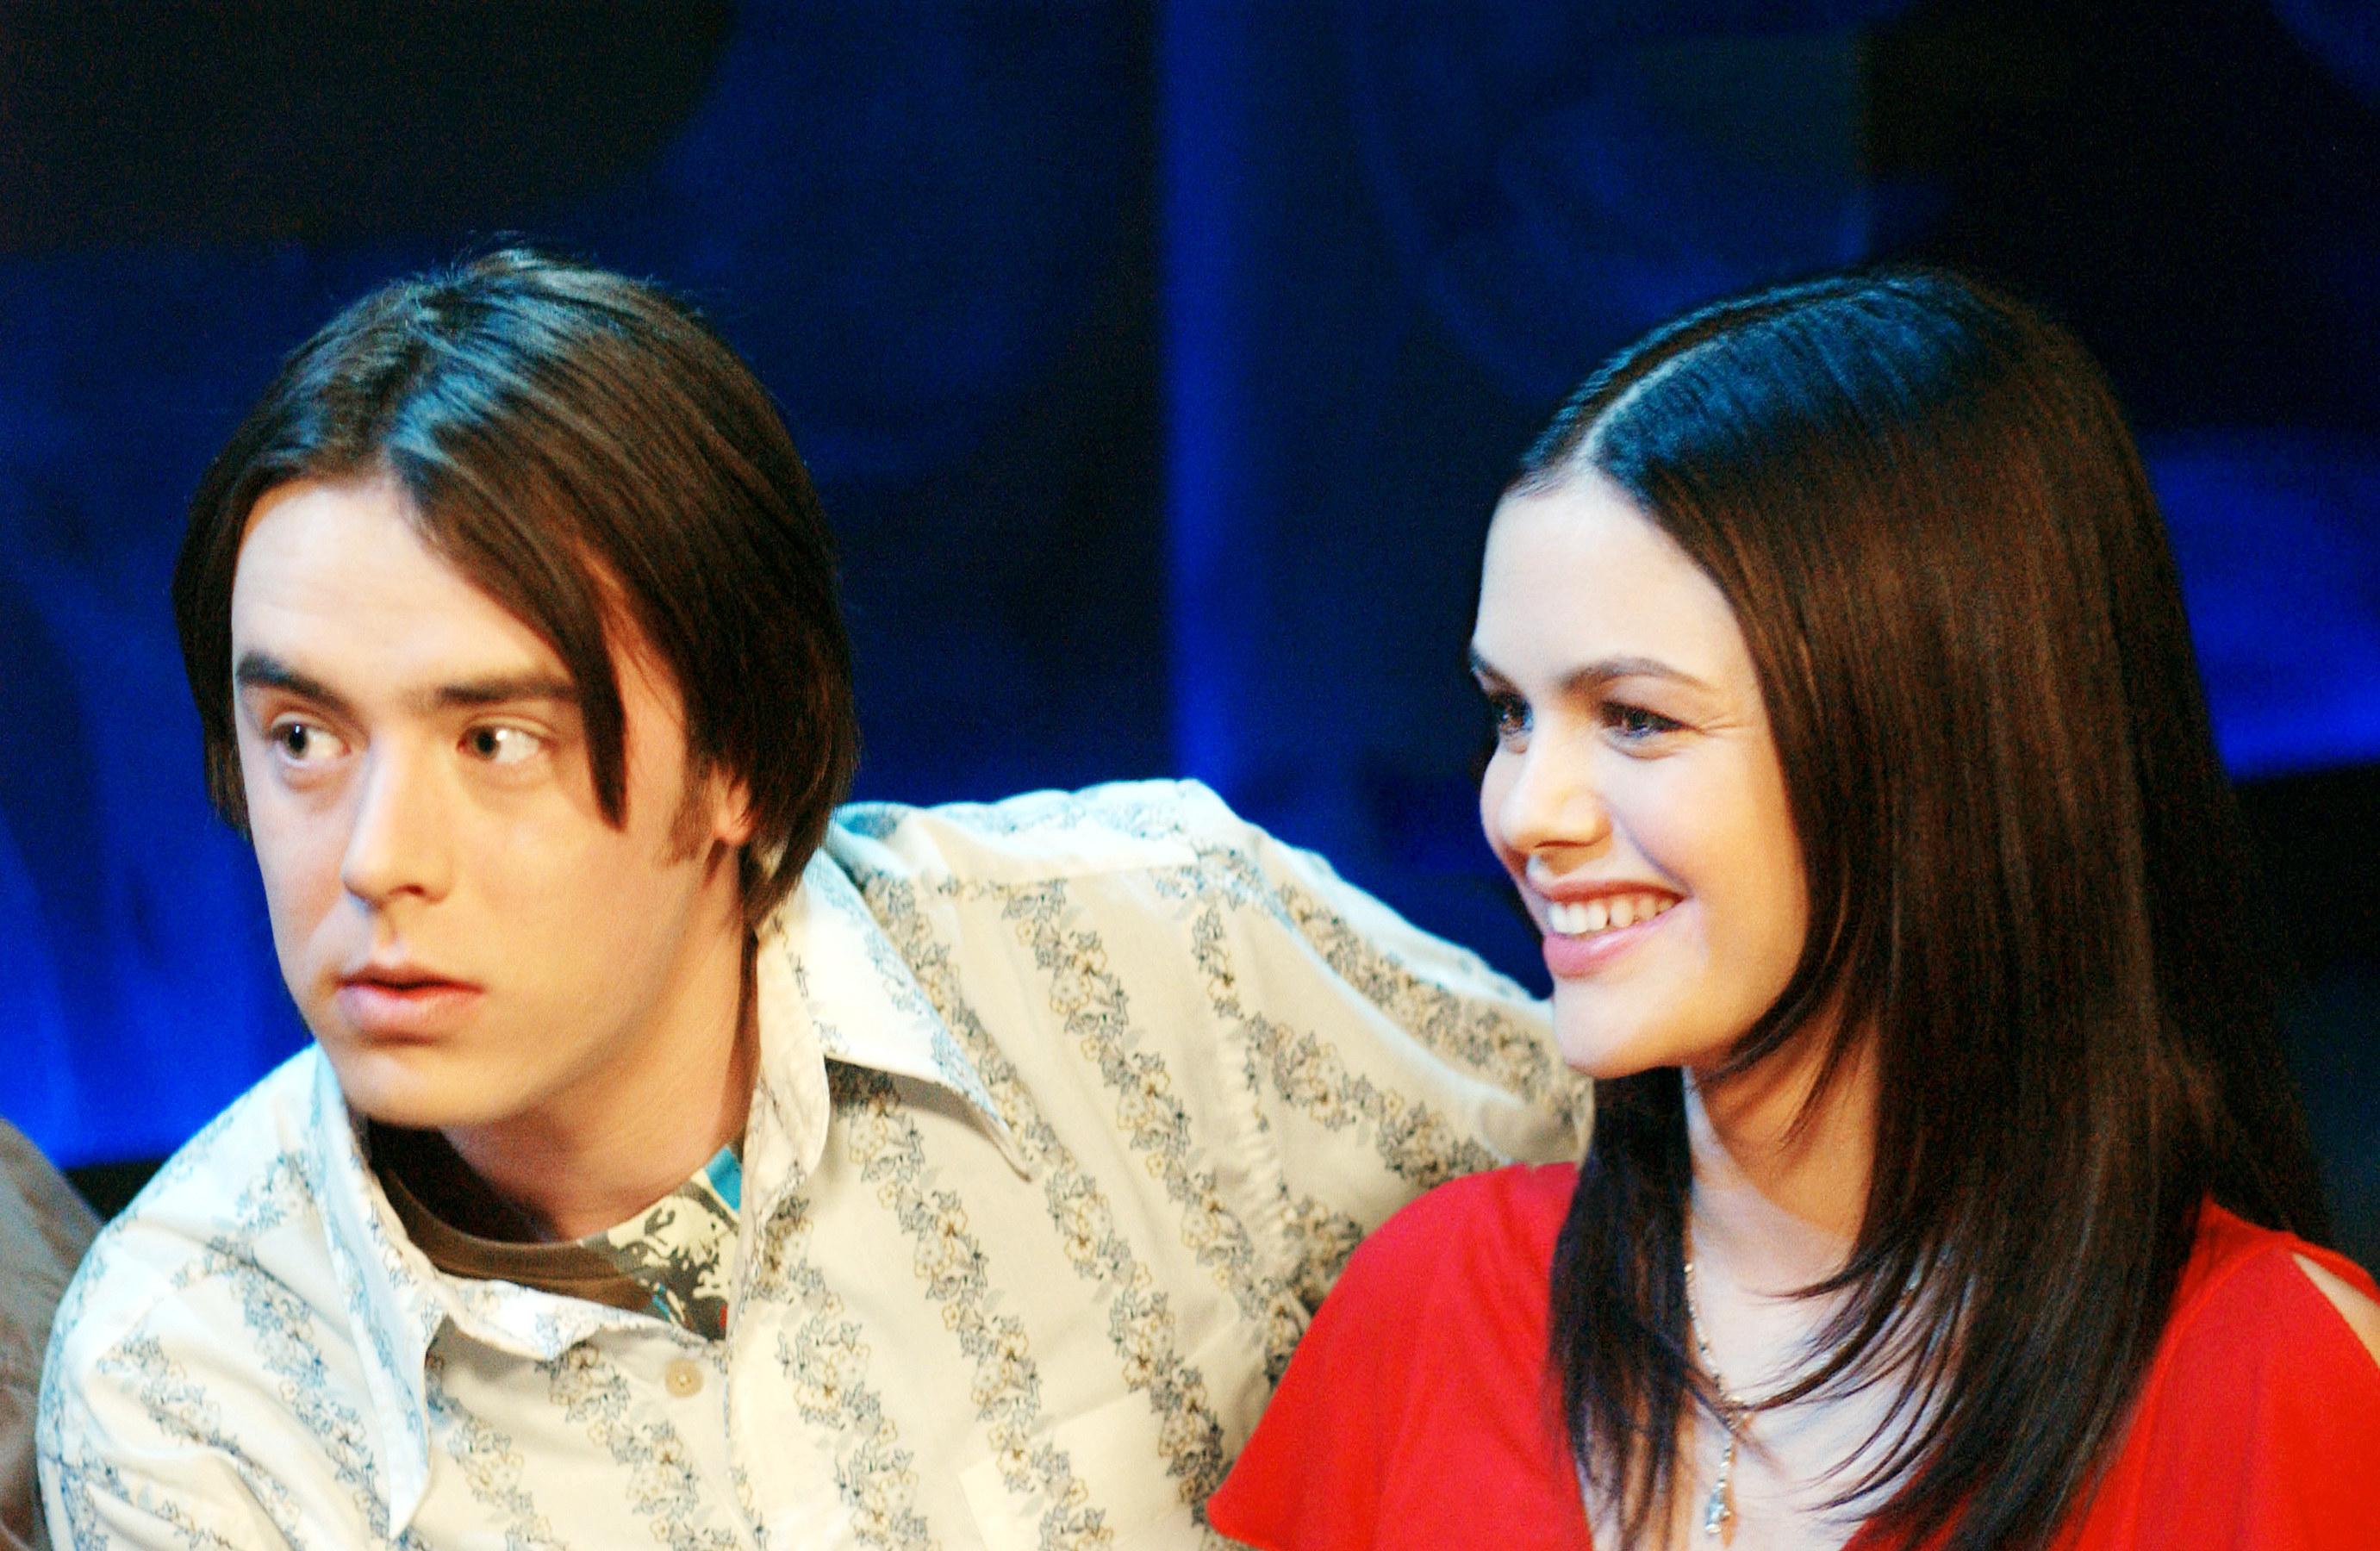 Colin/Grady sitting next to Rachel